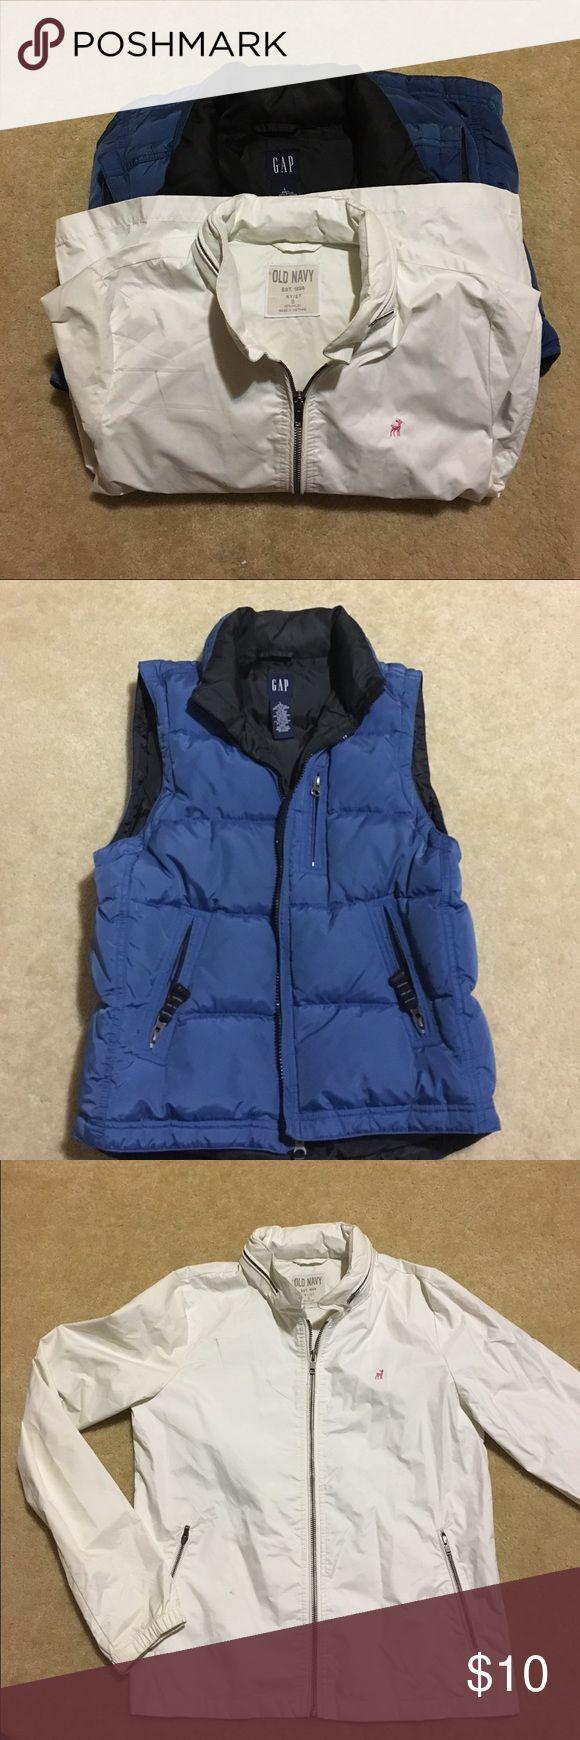 💥💥2/Gap blue vest+Old Navy rain jacket with hood Gap blue vest+Old Navy rain jacket with hood Size S GAP Jackets & Coats Utility Jackets